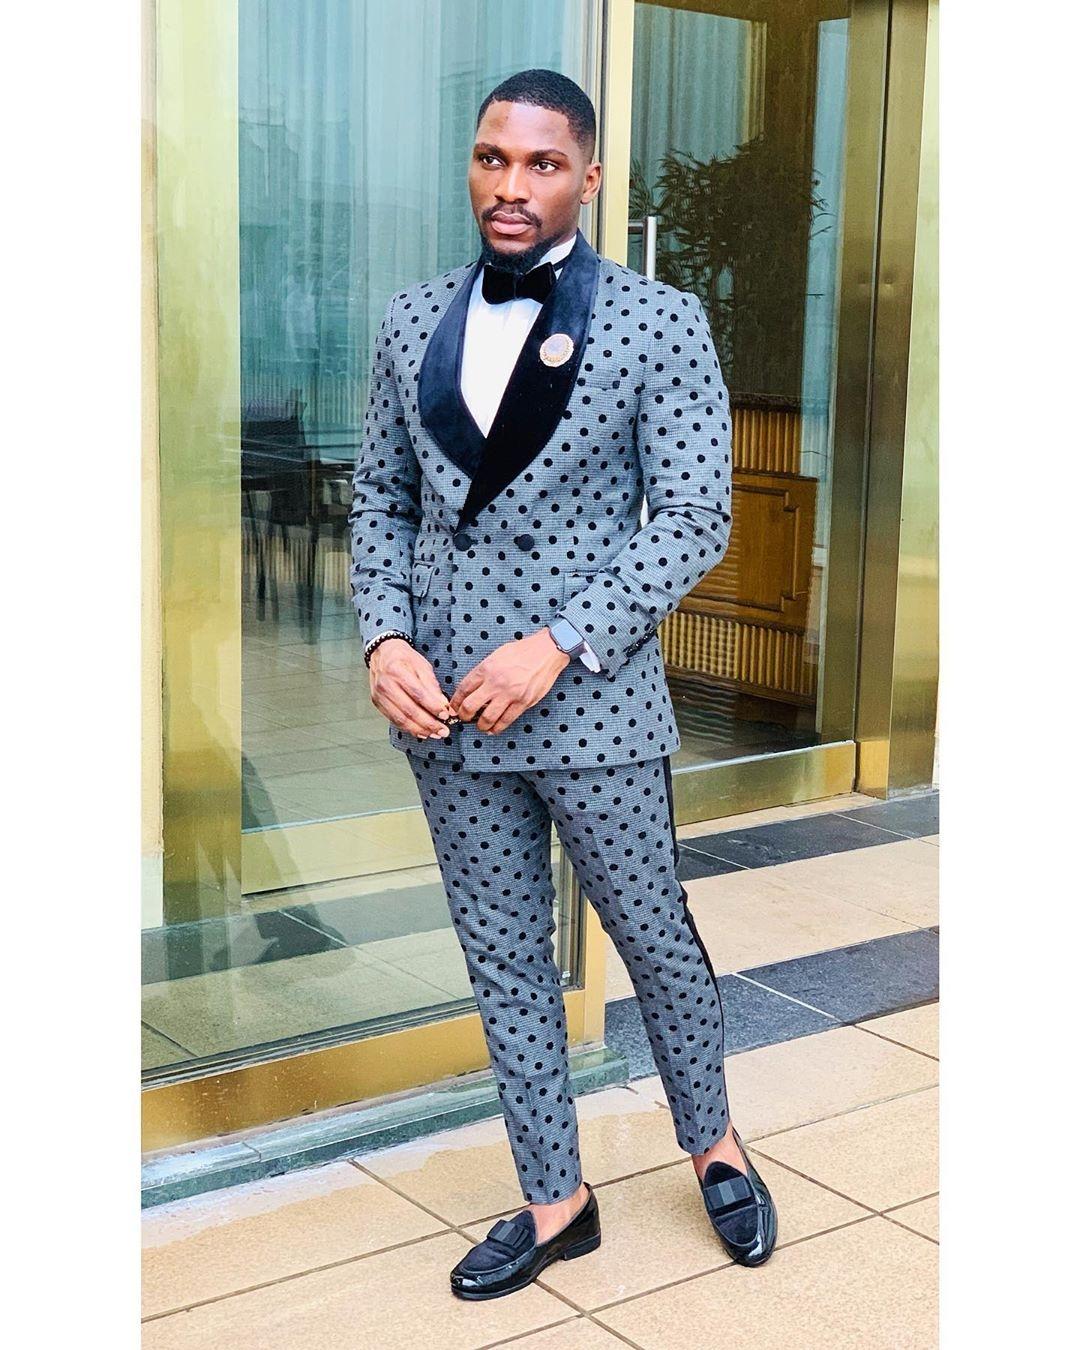 Tobi-bakre-Nigerian-male-celebrities-style-slay-style-rave